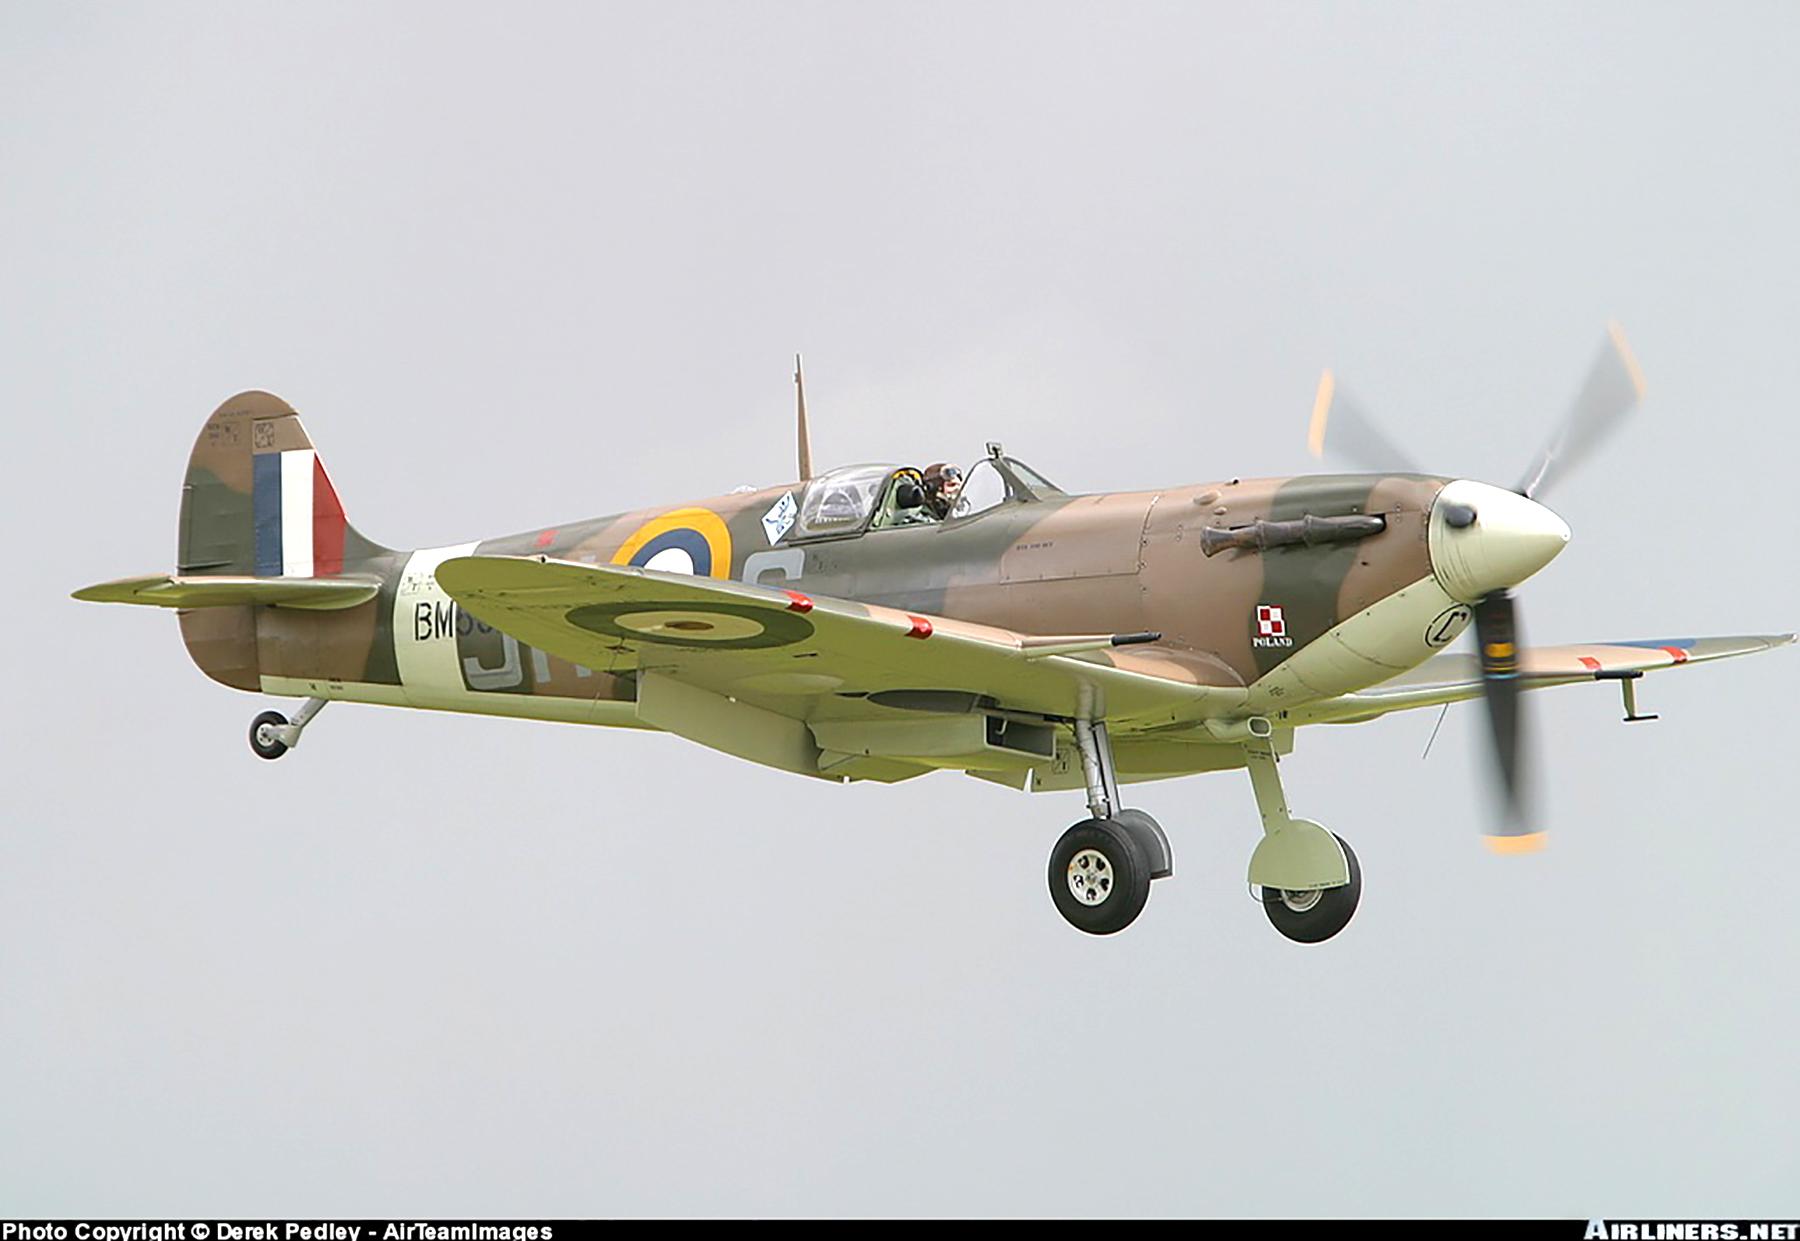 Airworthy Spitfire warbird MkVb RAF 317Sqn JHC BM597 G MKVB 20